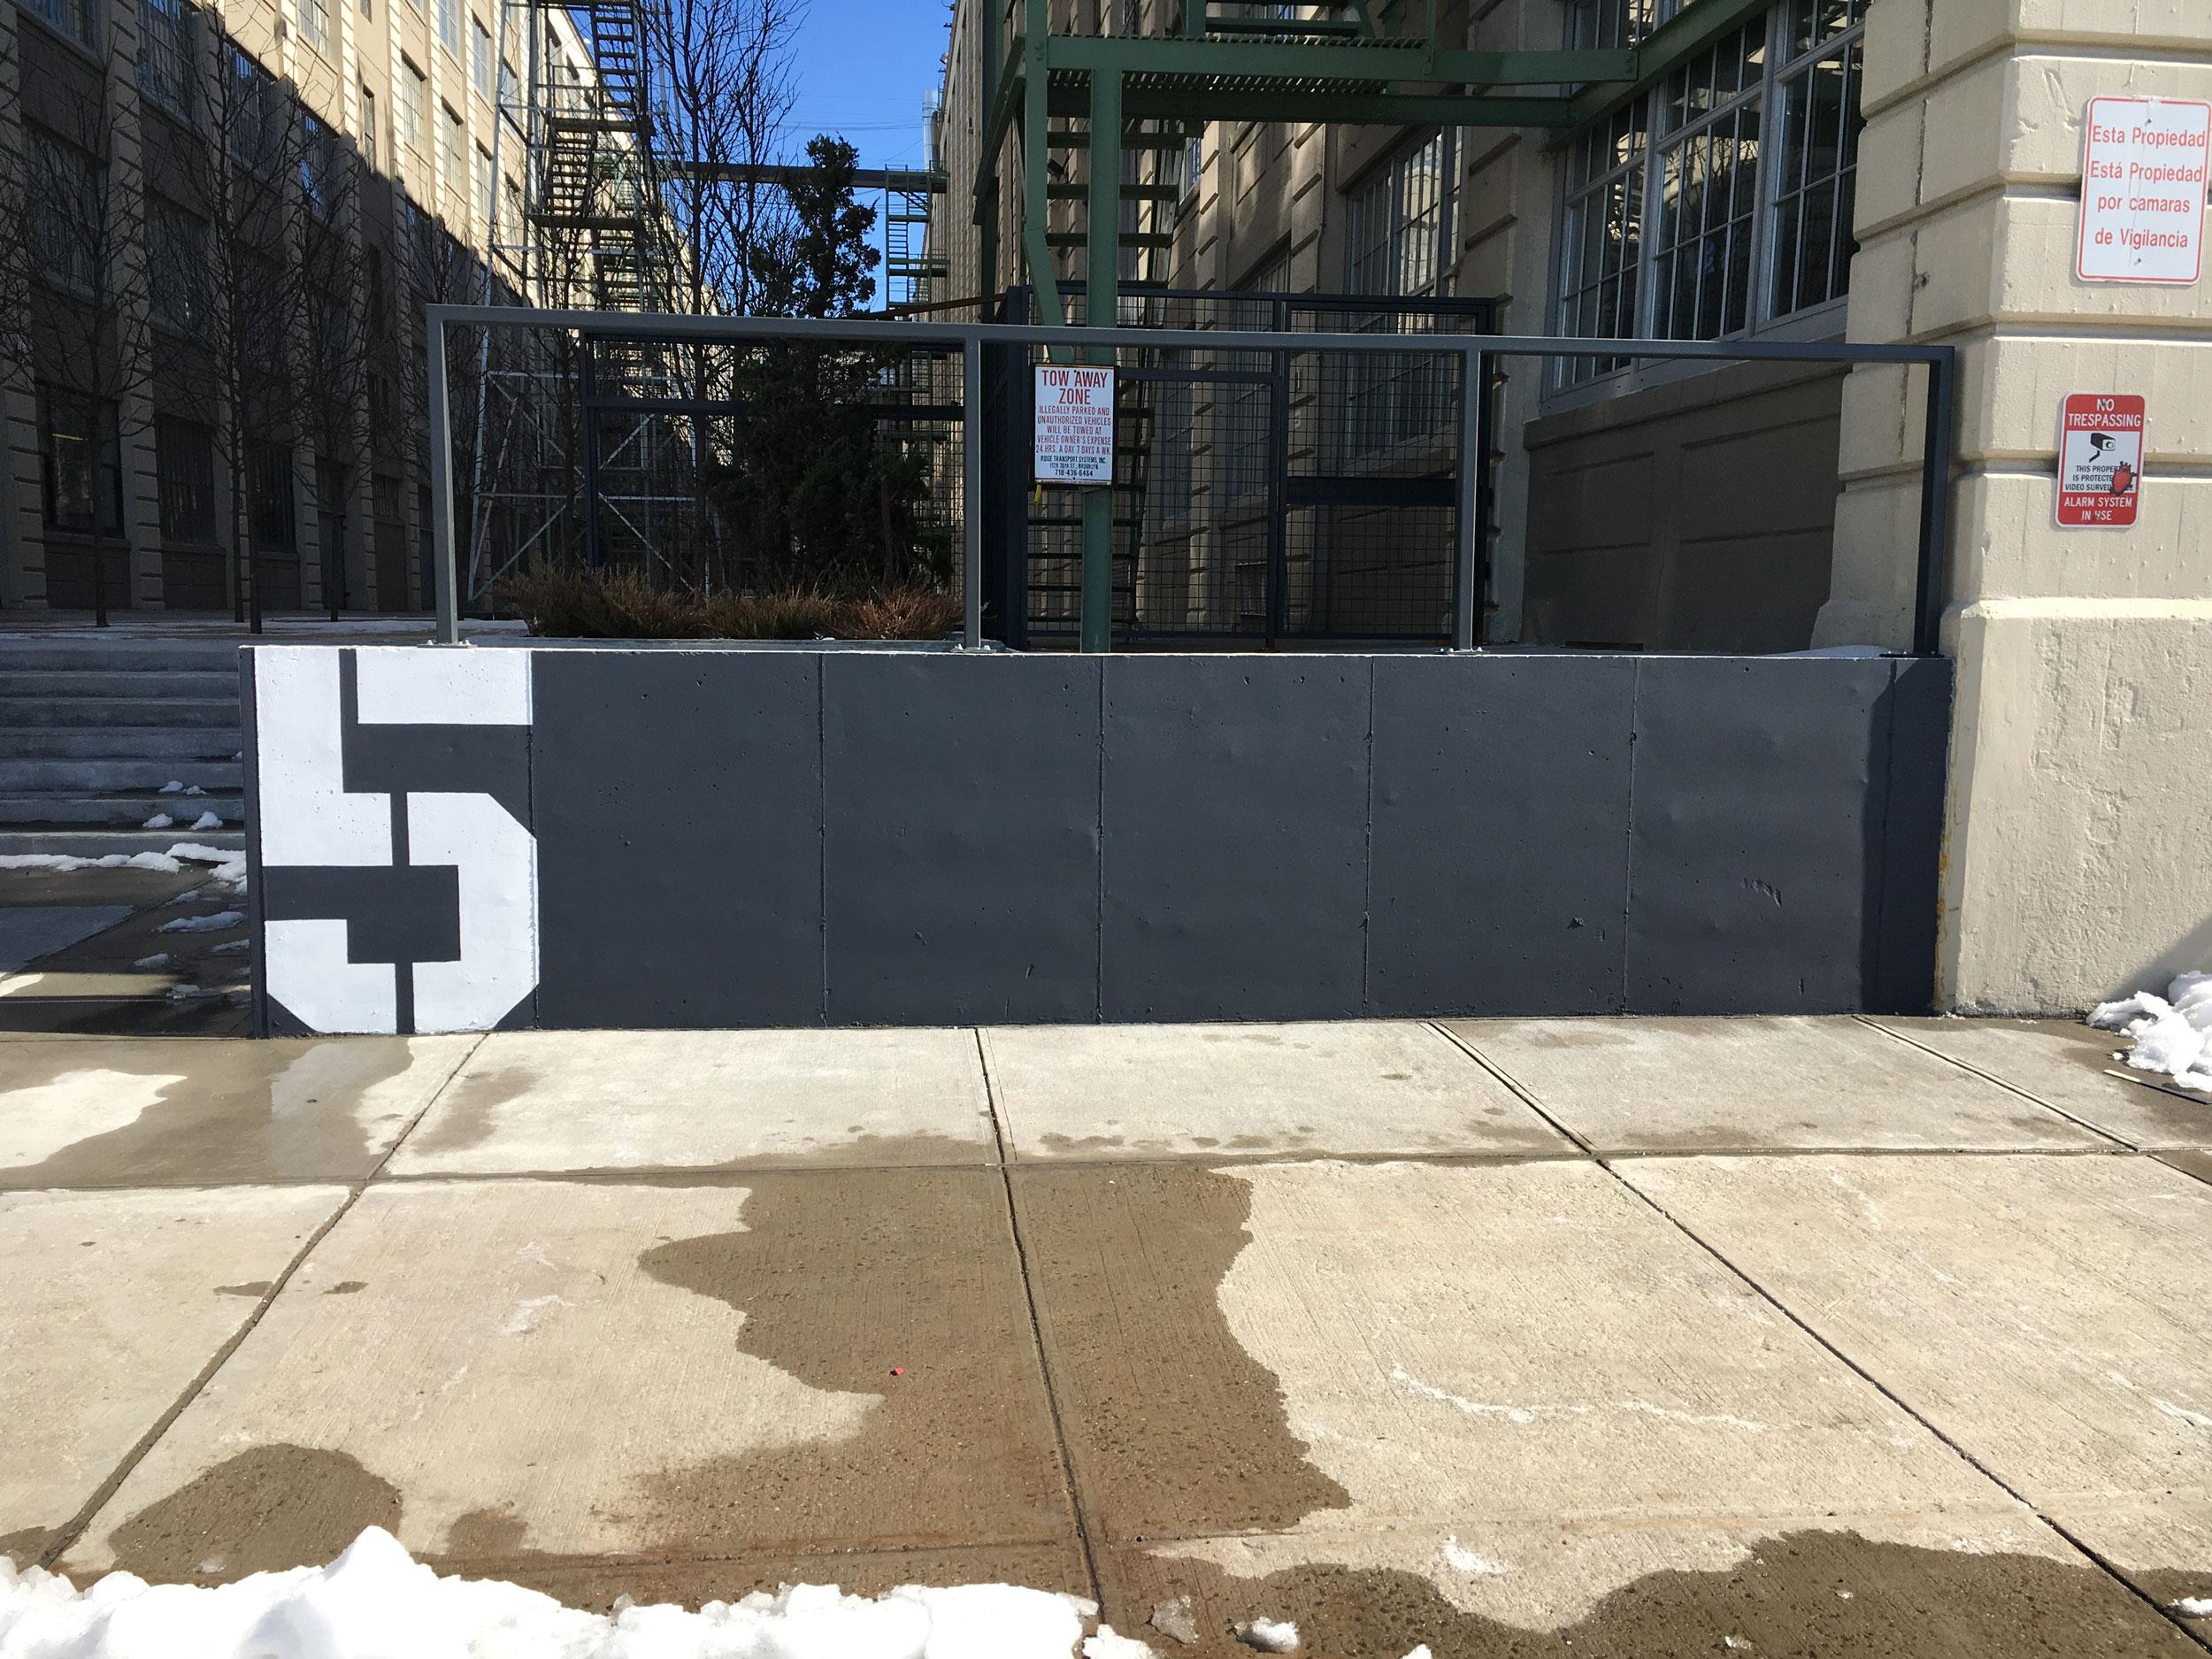 Bldg 5 Wall